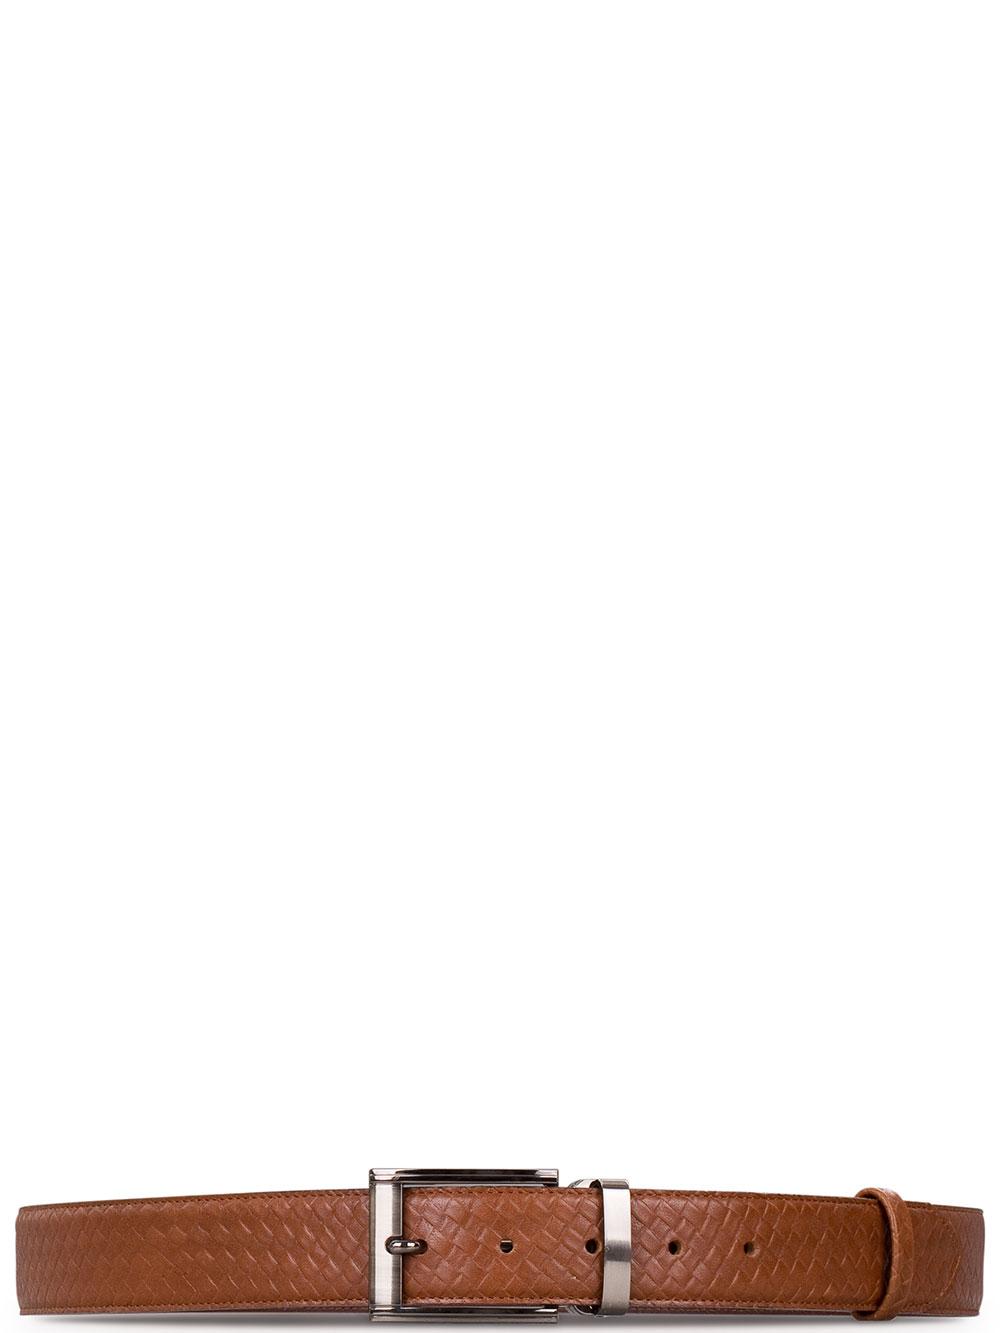 efa1841014 Ζώνες ανδρικά Classico Uomo Ταμπά 0401